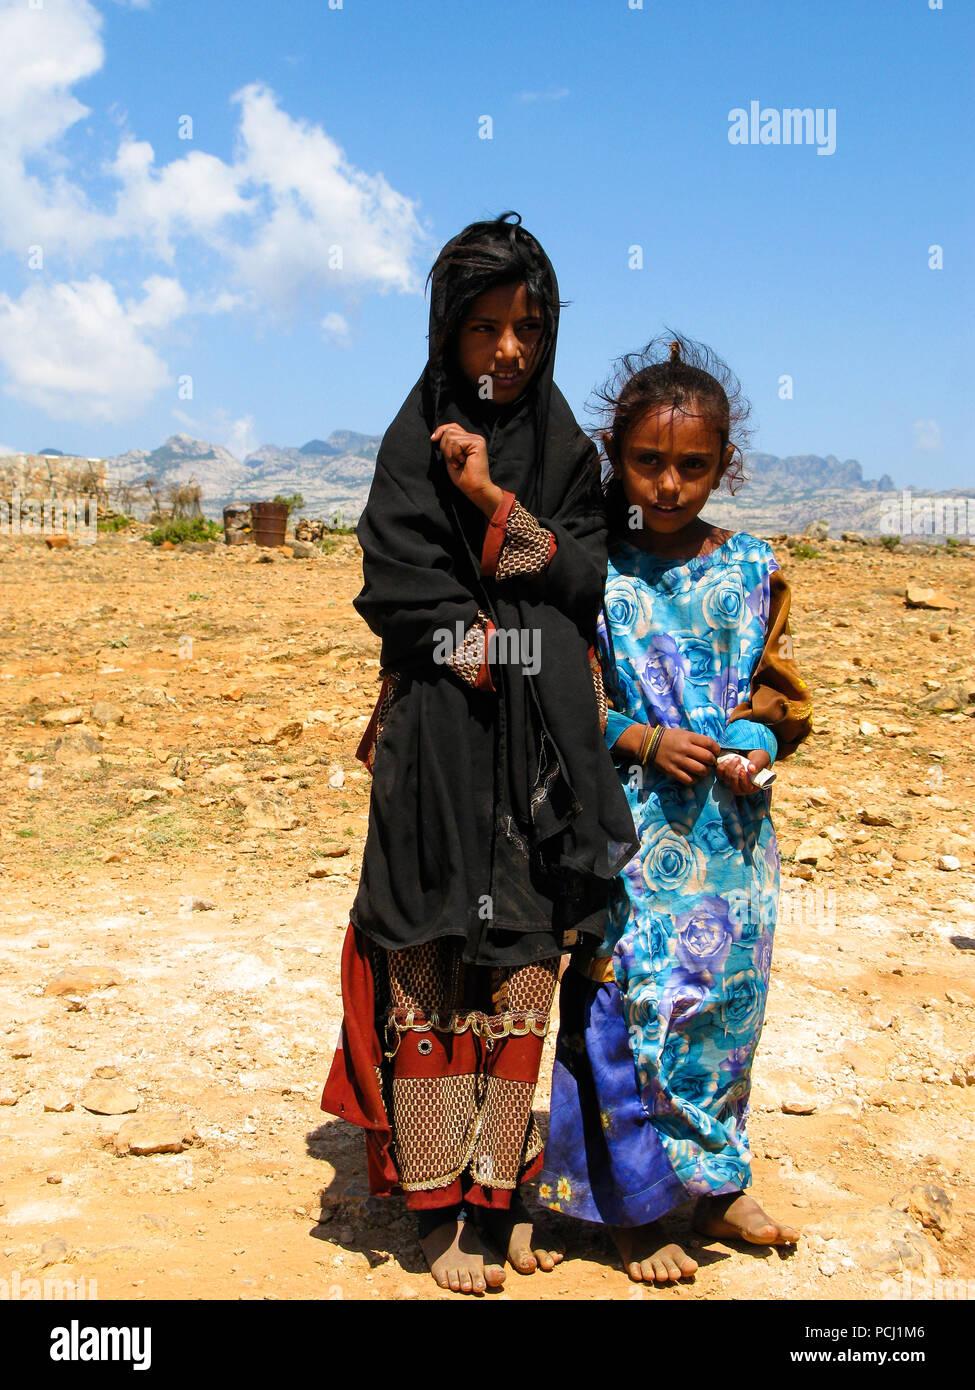 Portrait of Soqotri Al-Mahrah tribe women - 10-11-2009 Socotra island, Yemen - Stock Image